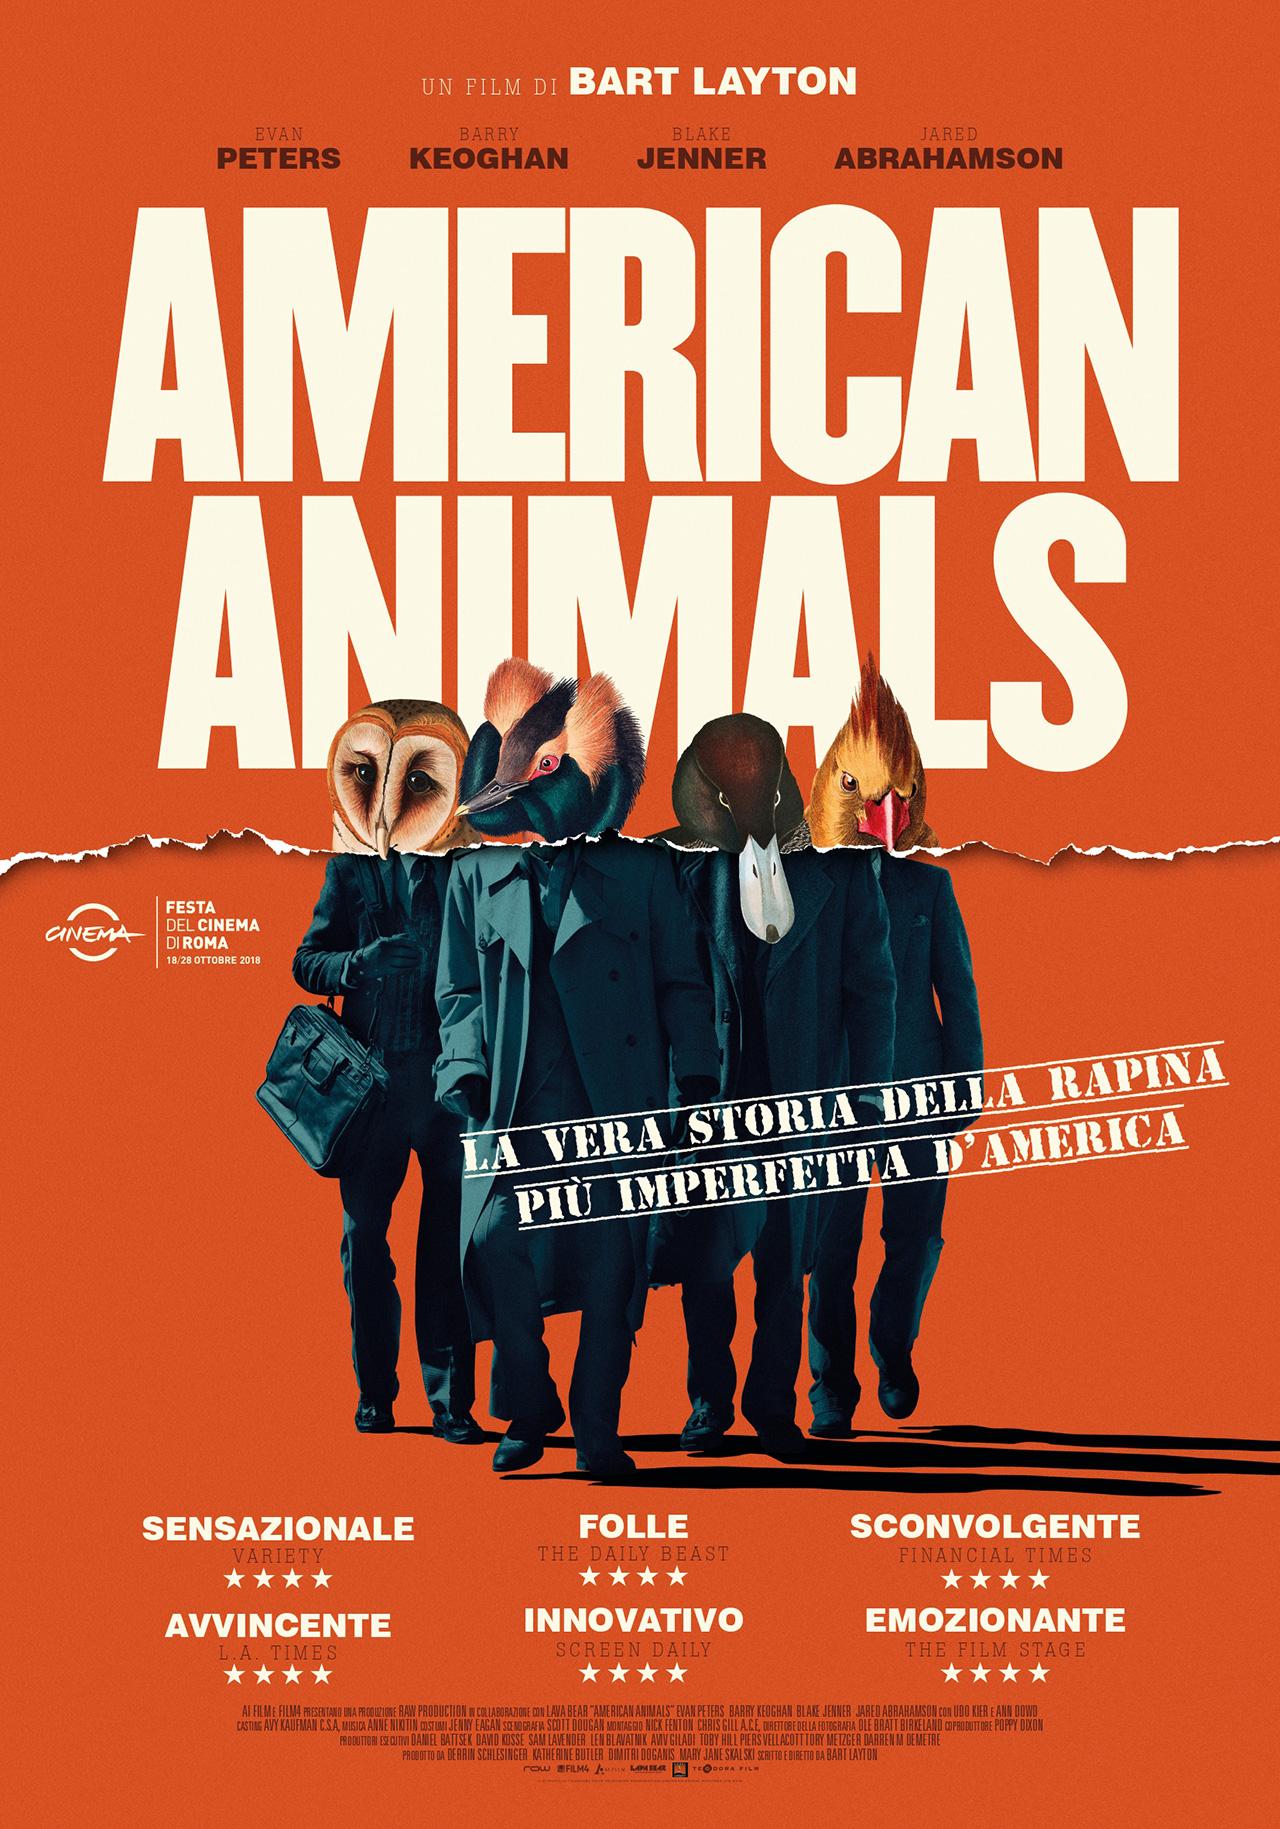 AMERICAN ANIMALS – Bart Layton # USA 2018 (116′)